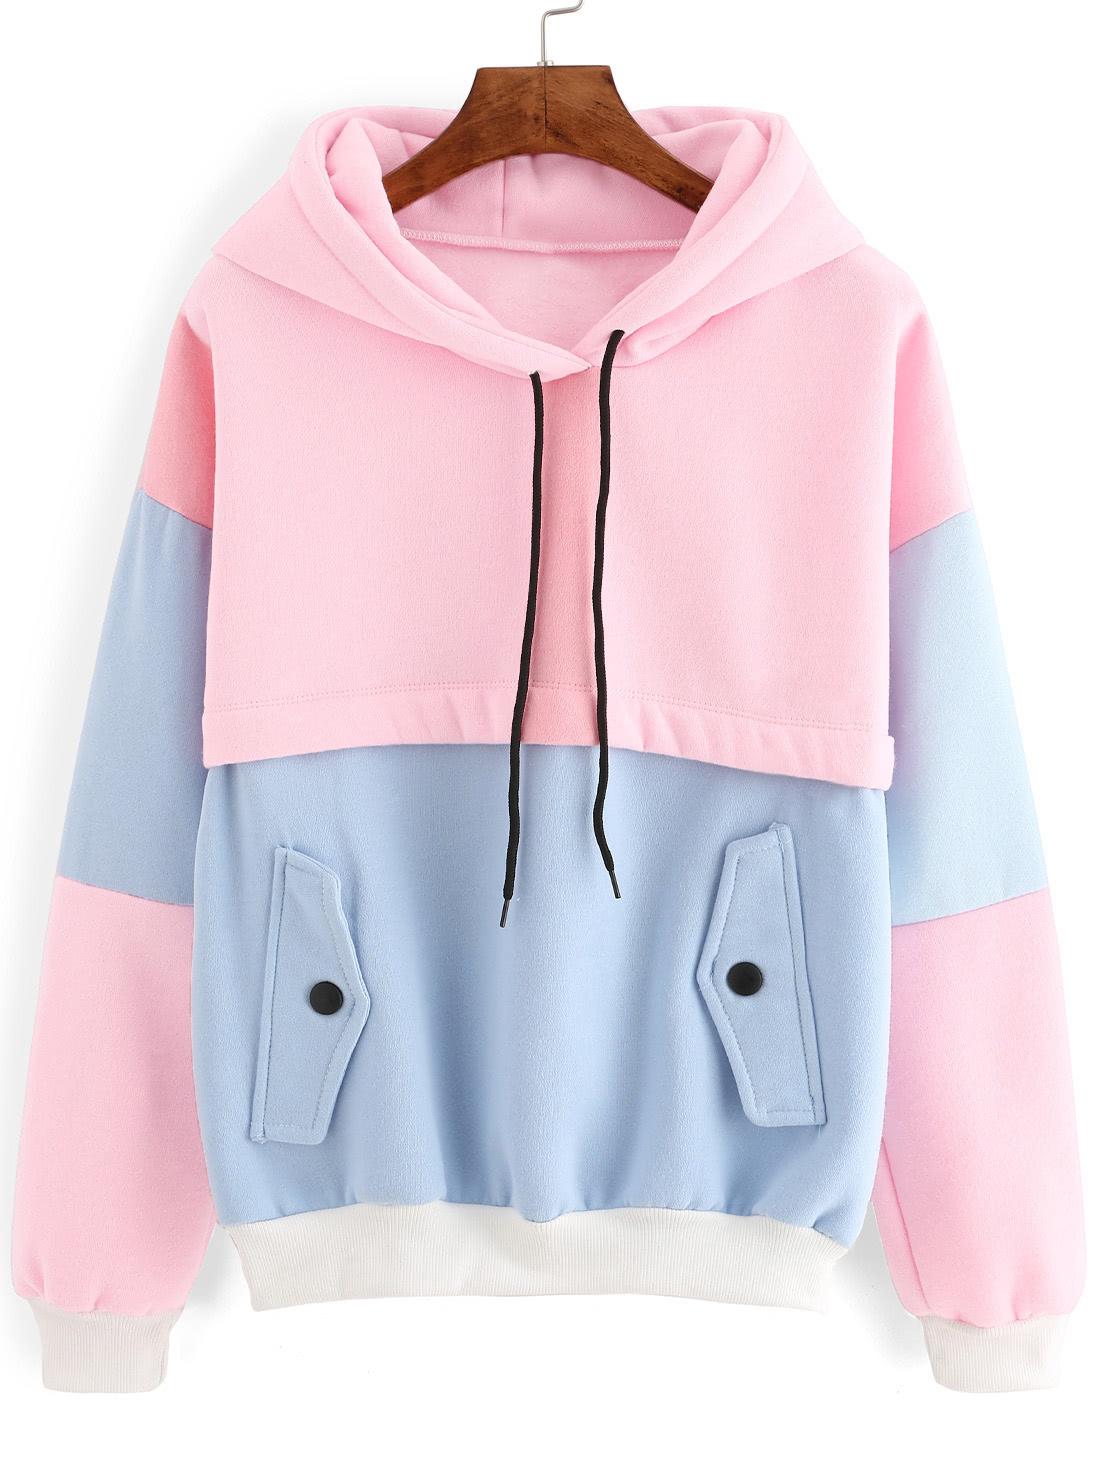 Color Block Drawstring Hooded Sweatshirtfor Women Romwe